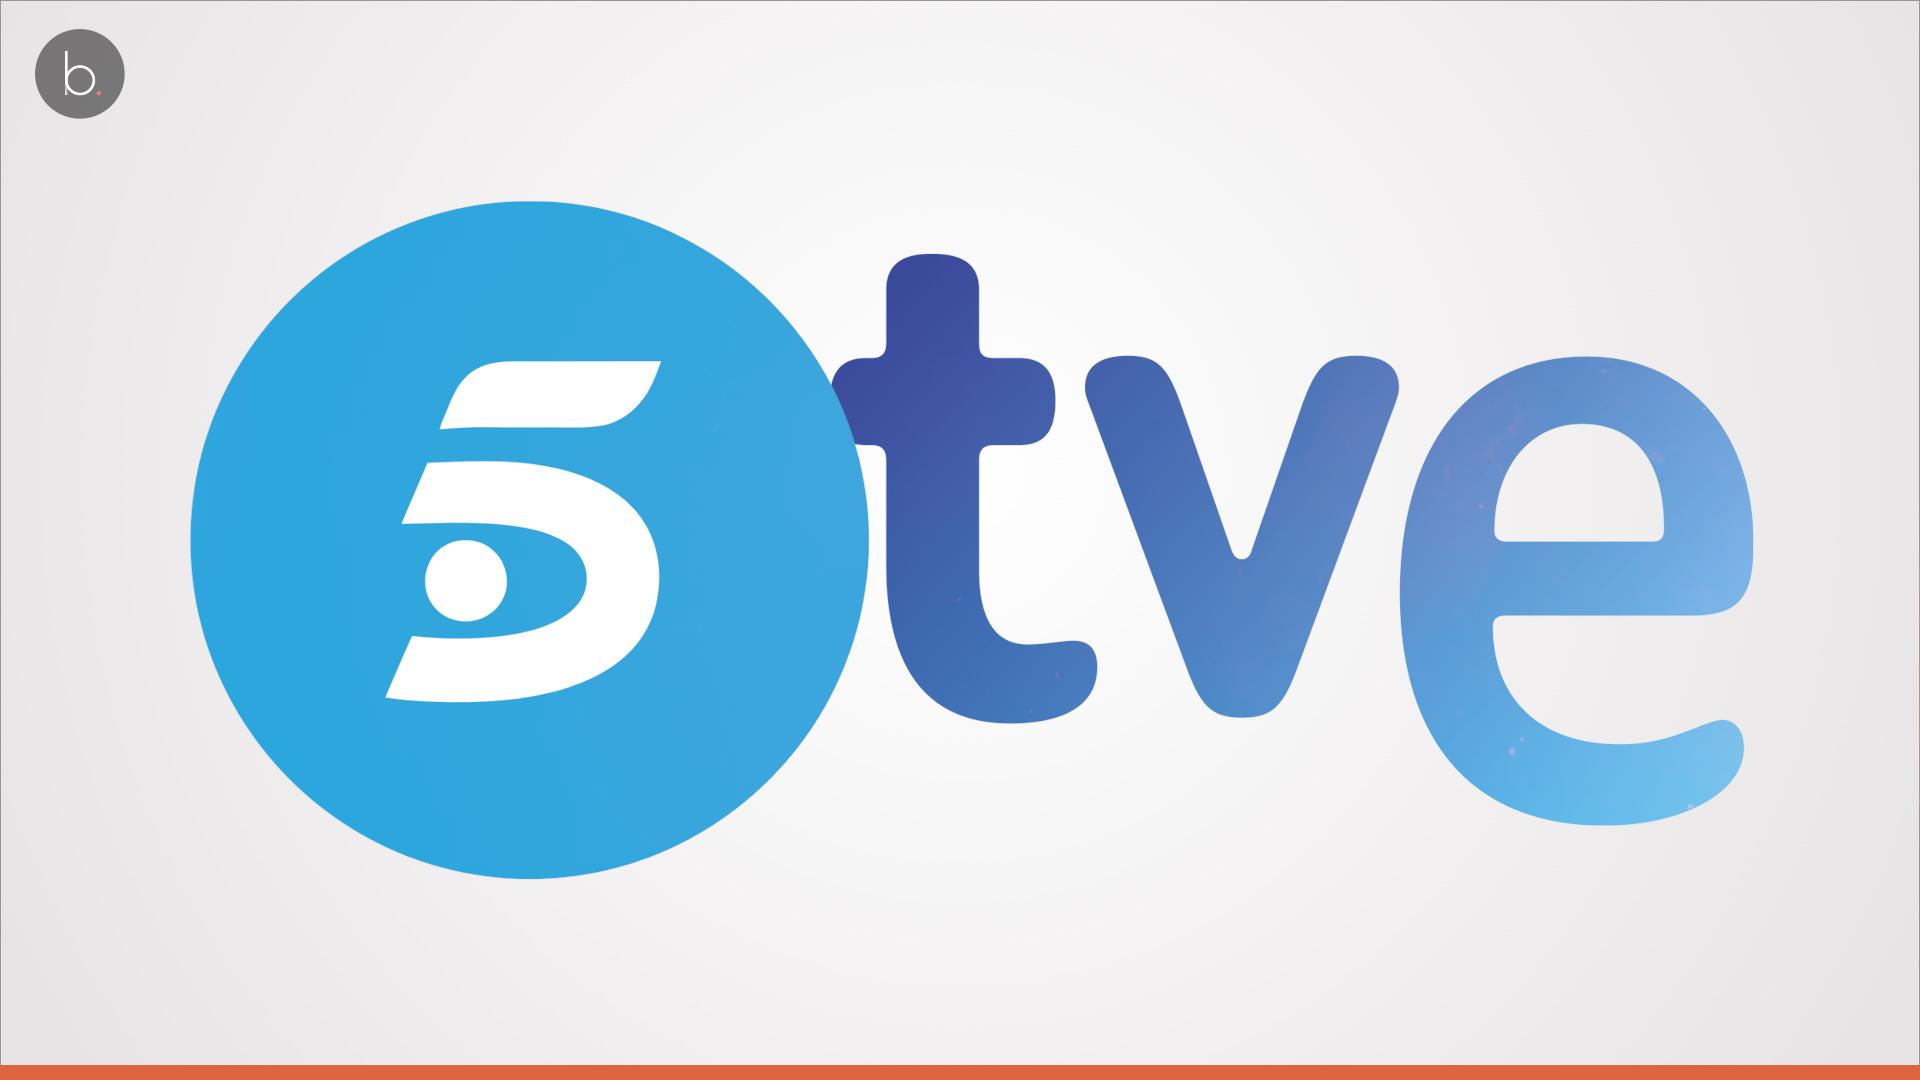 ¡Duelo de titanes entre dos cadenas de televisión!